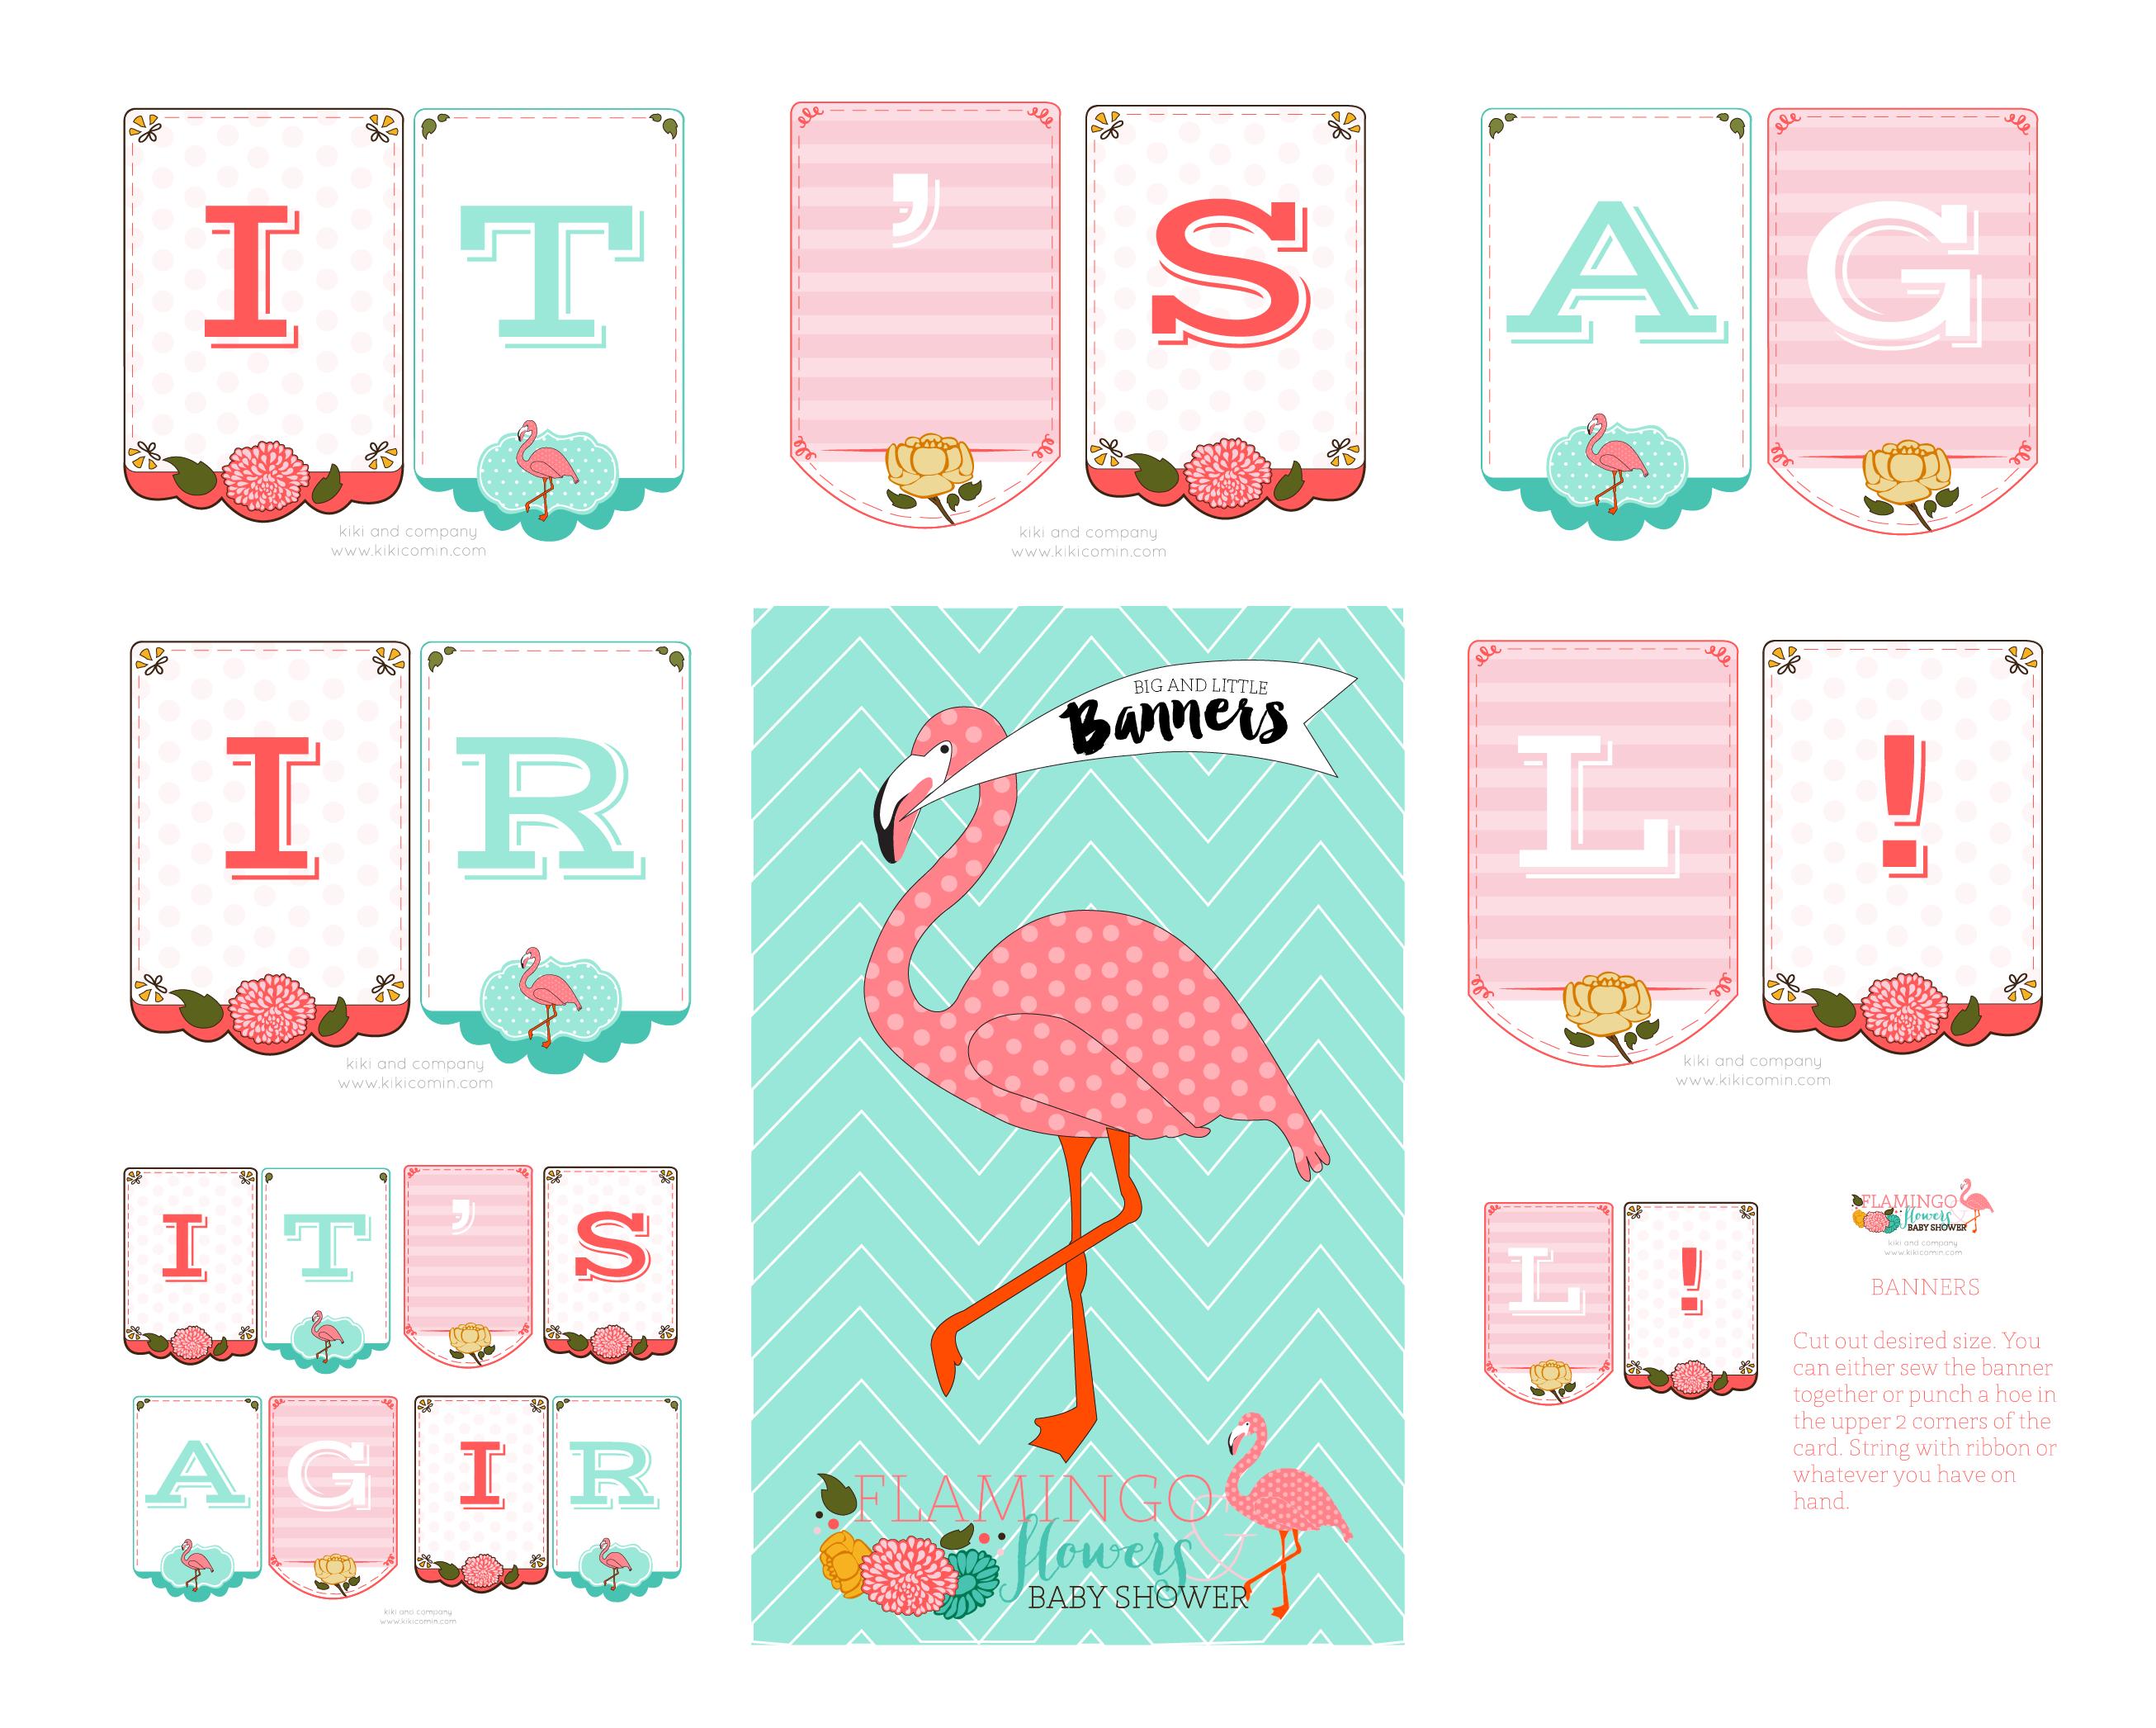 Flamingos and Flowers Baby Shower Kiki & pany